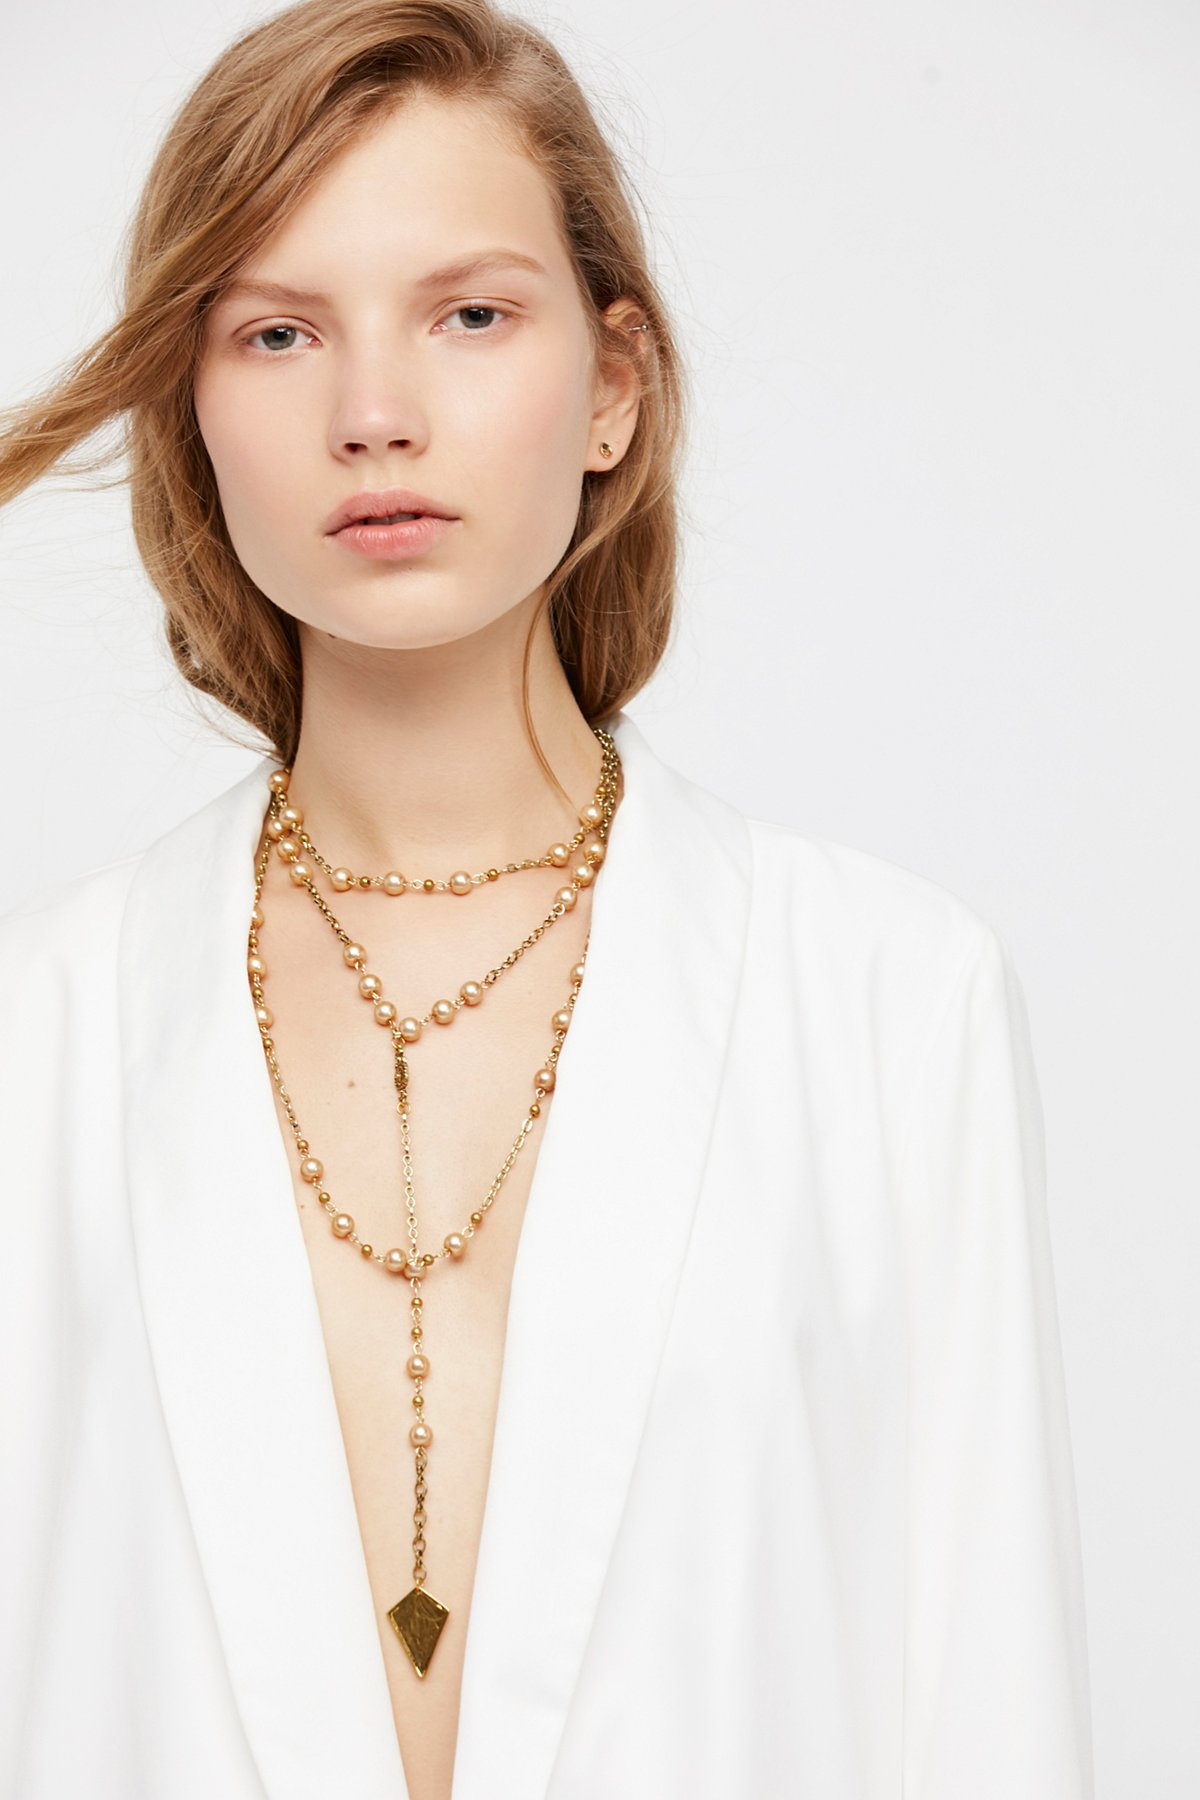 Marlena珍珠串珠项链